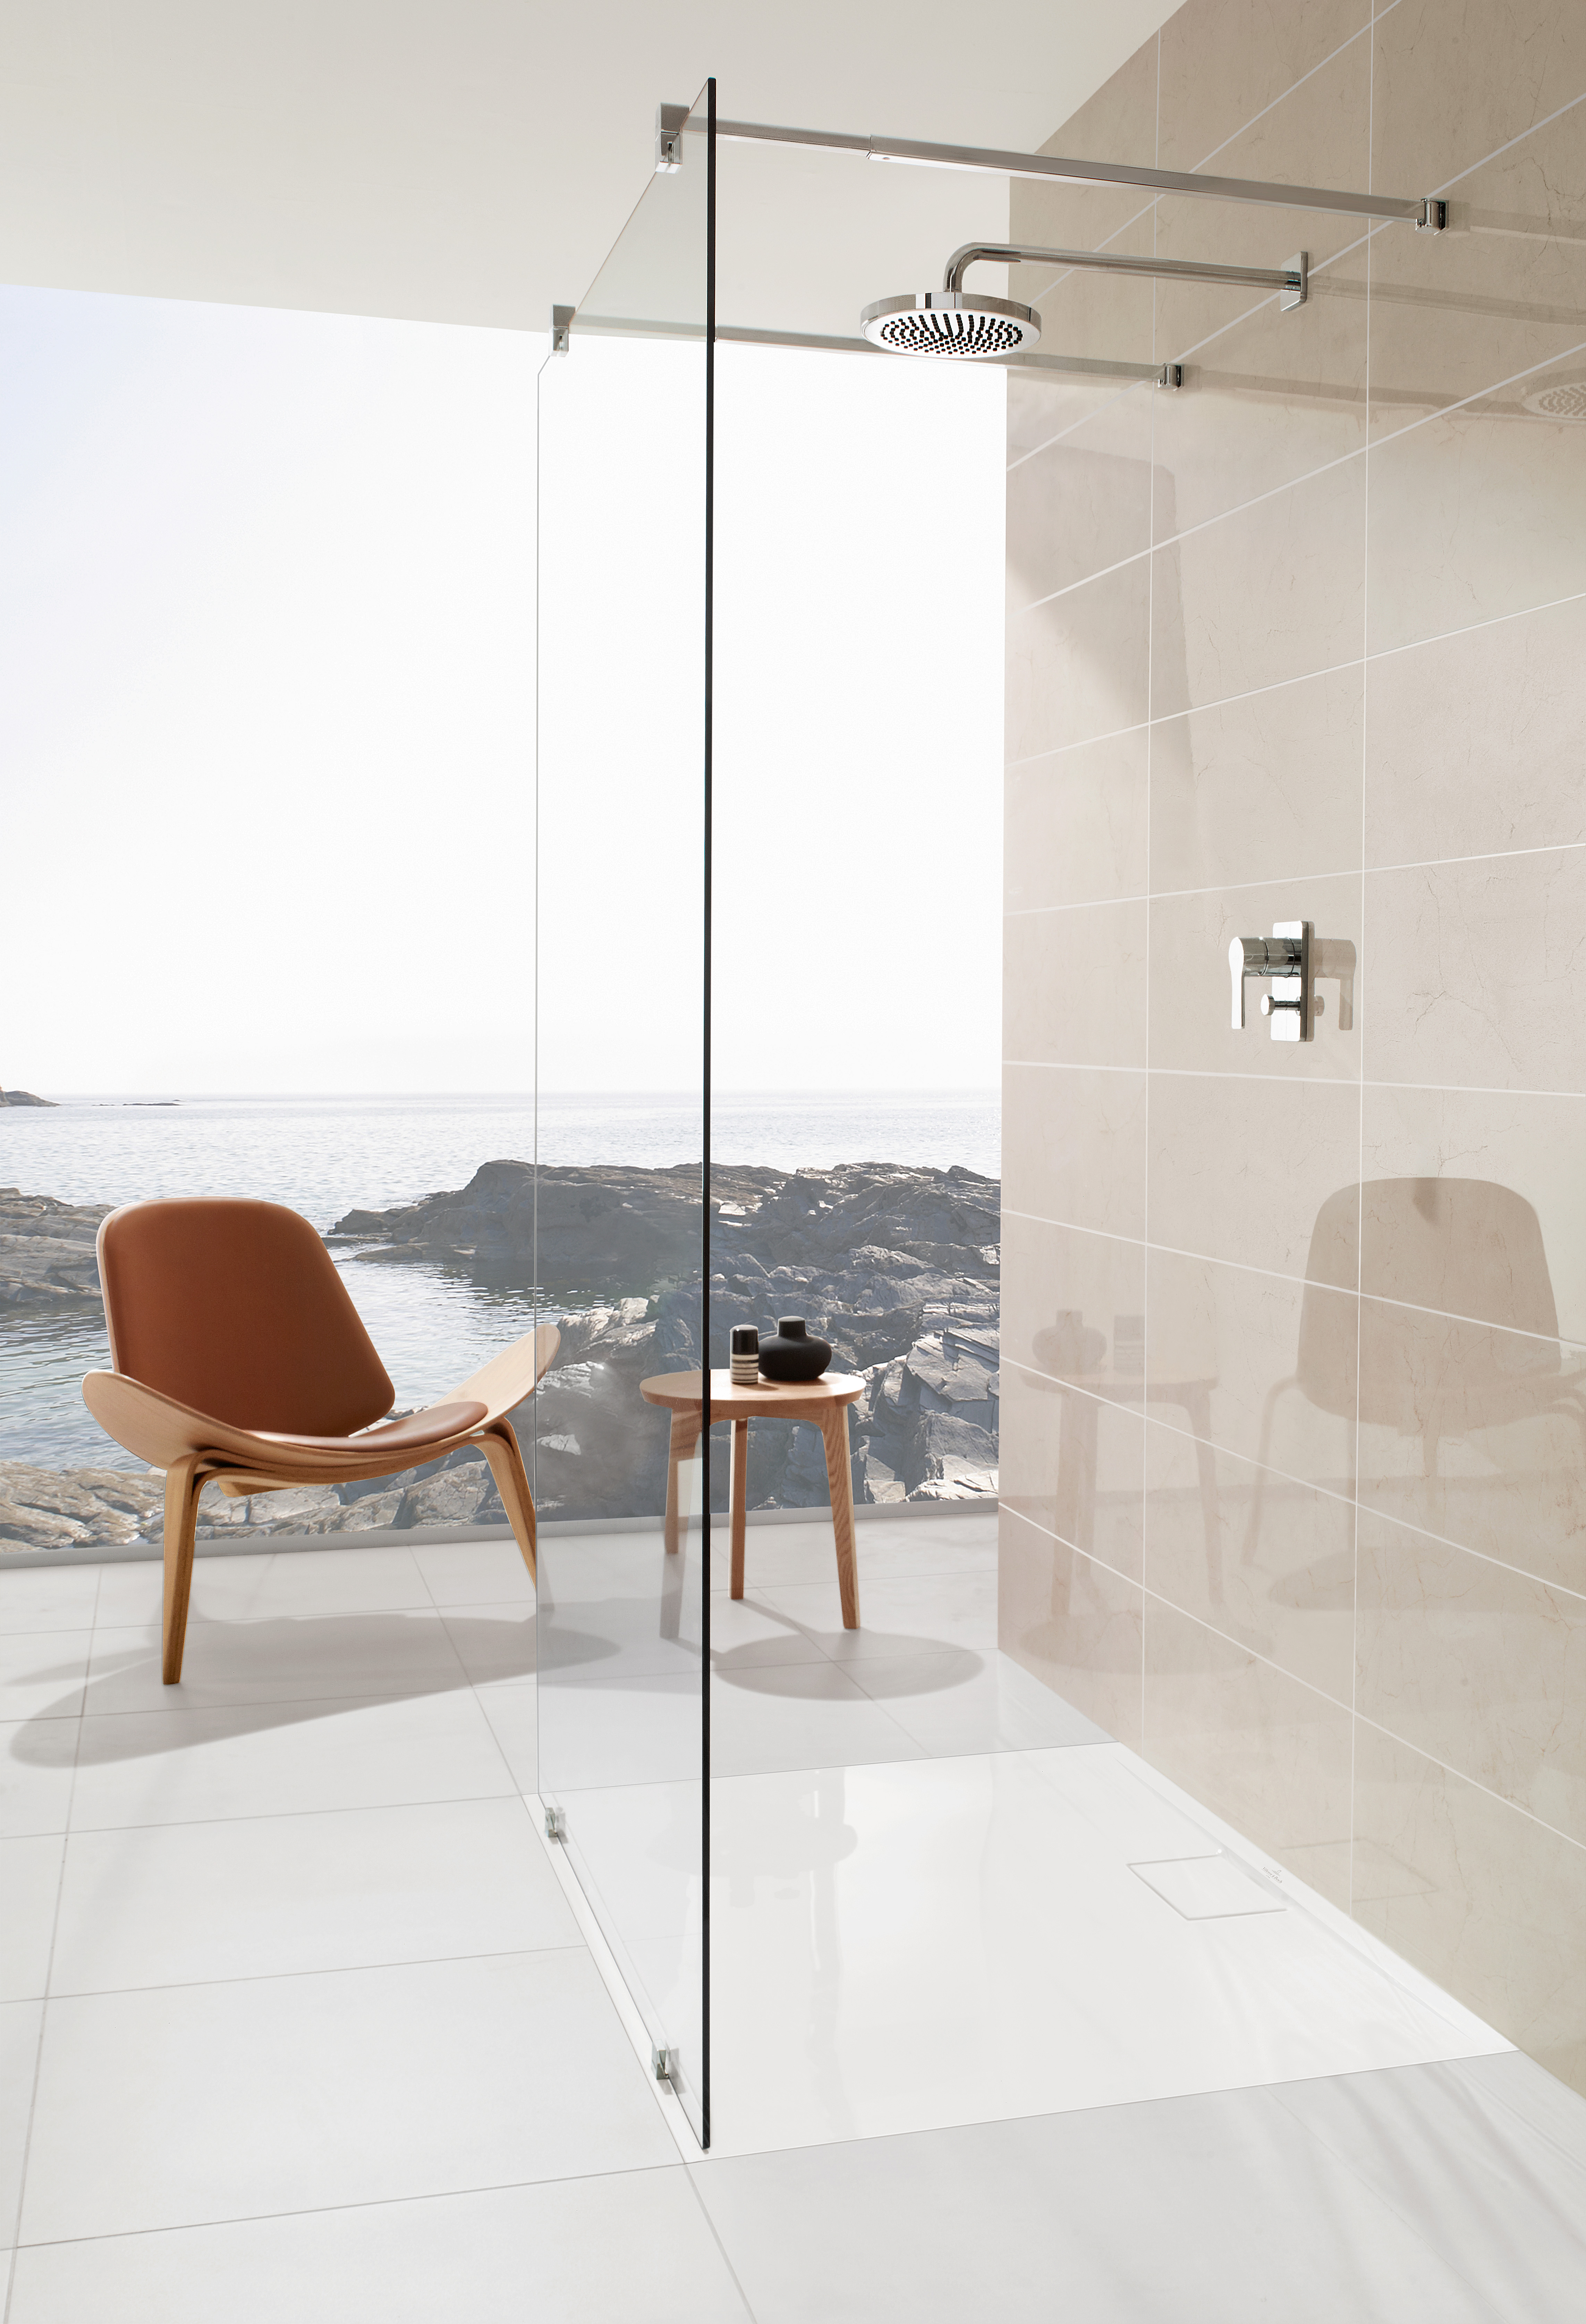 Architectura Shower tray, Shower trays (Acrylic, Quaryl), Shower trays